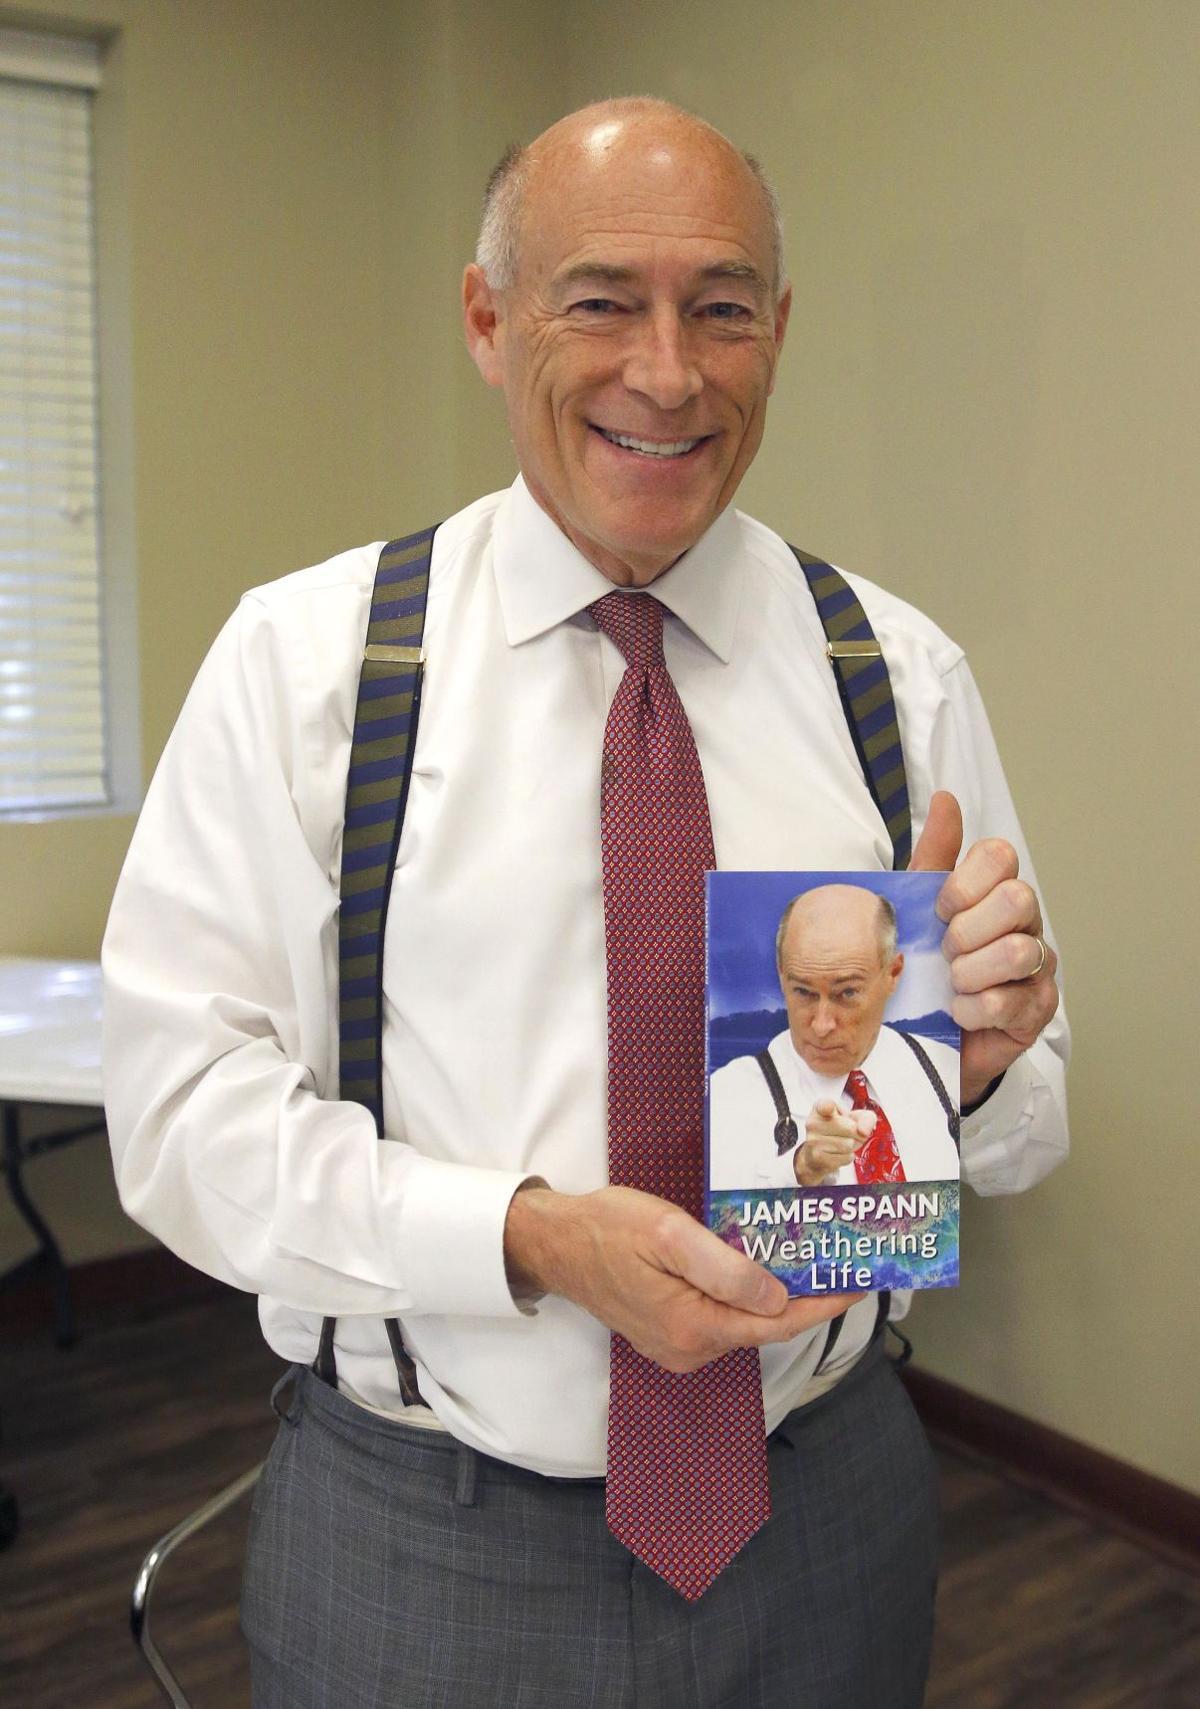 James Spann book signing